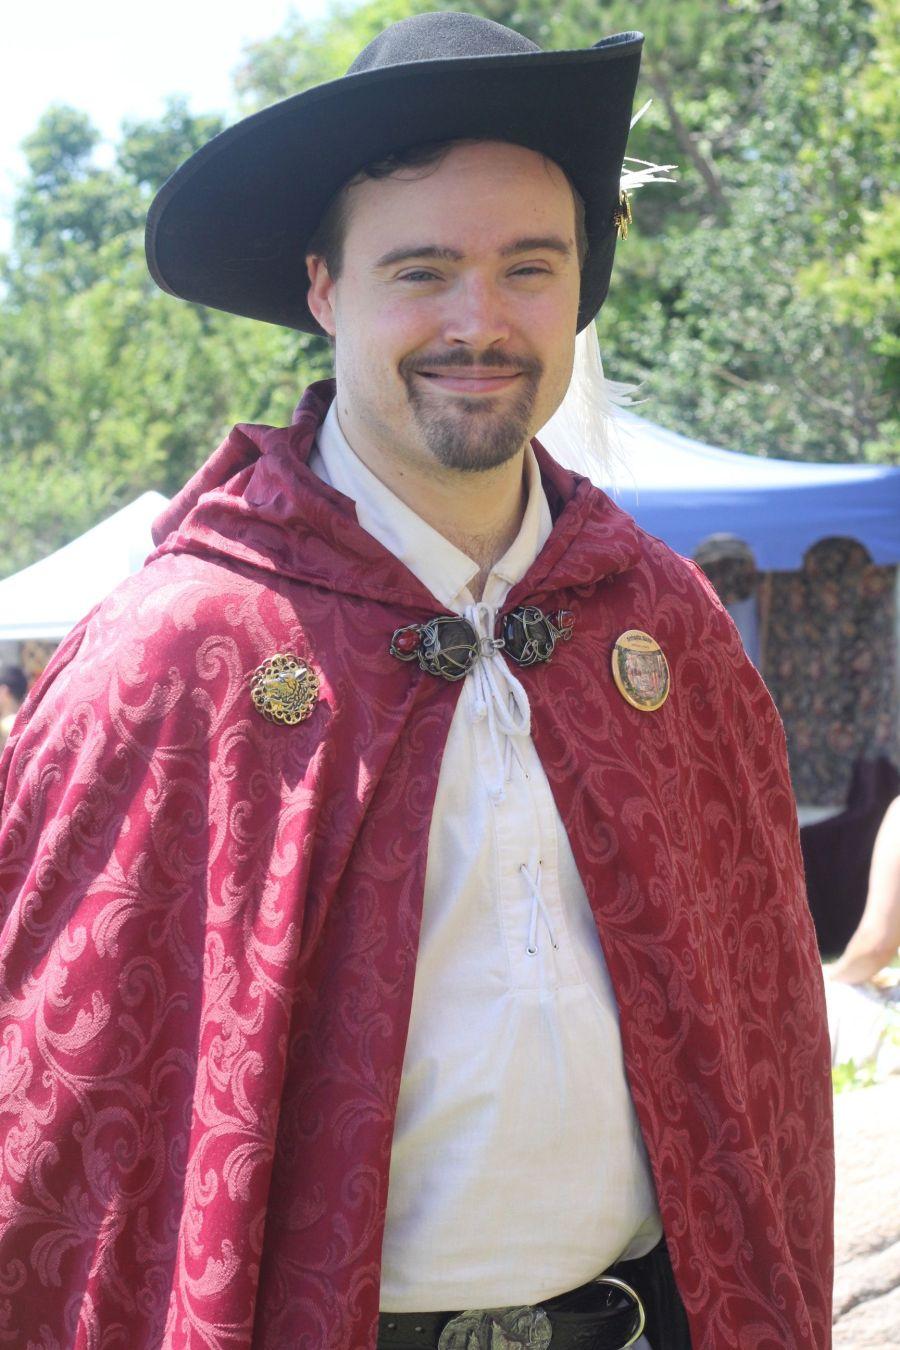 gloucester hammond castle renaissance fair man in red cape